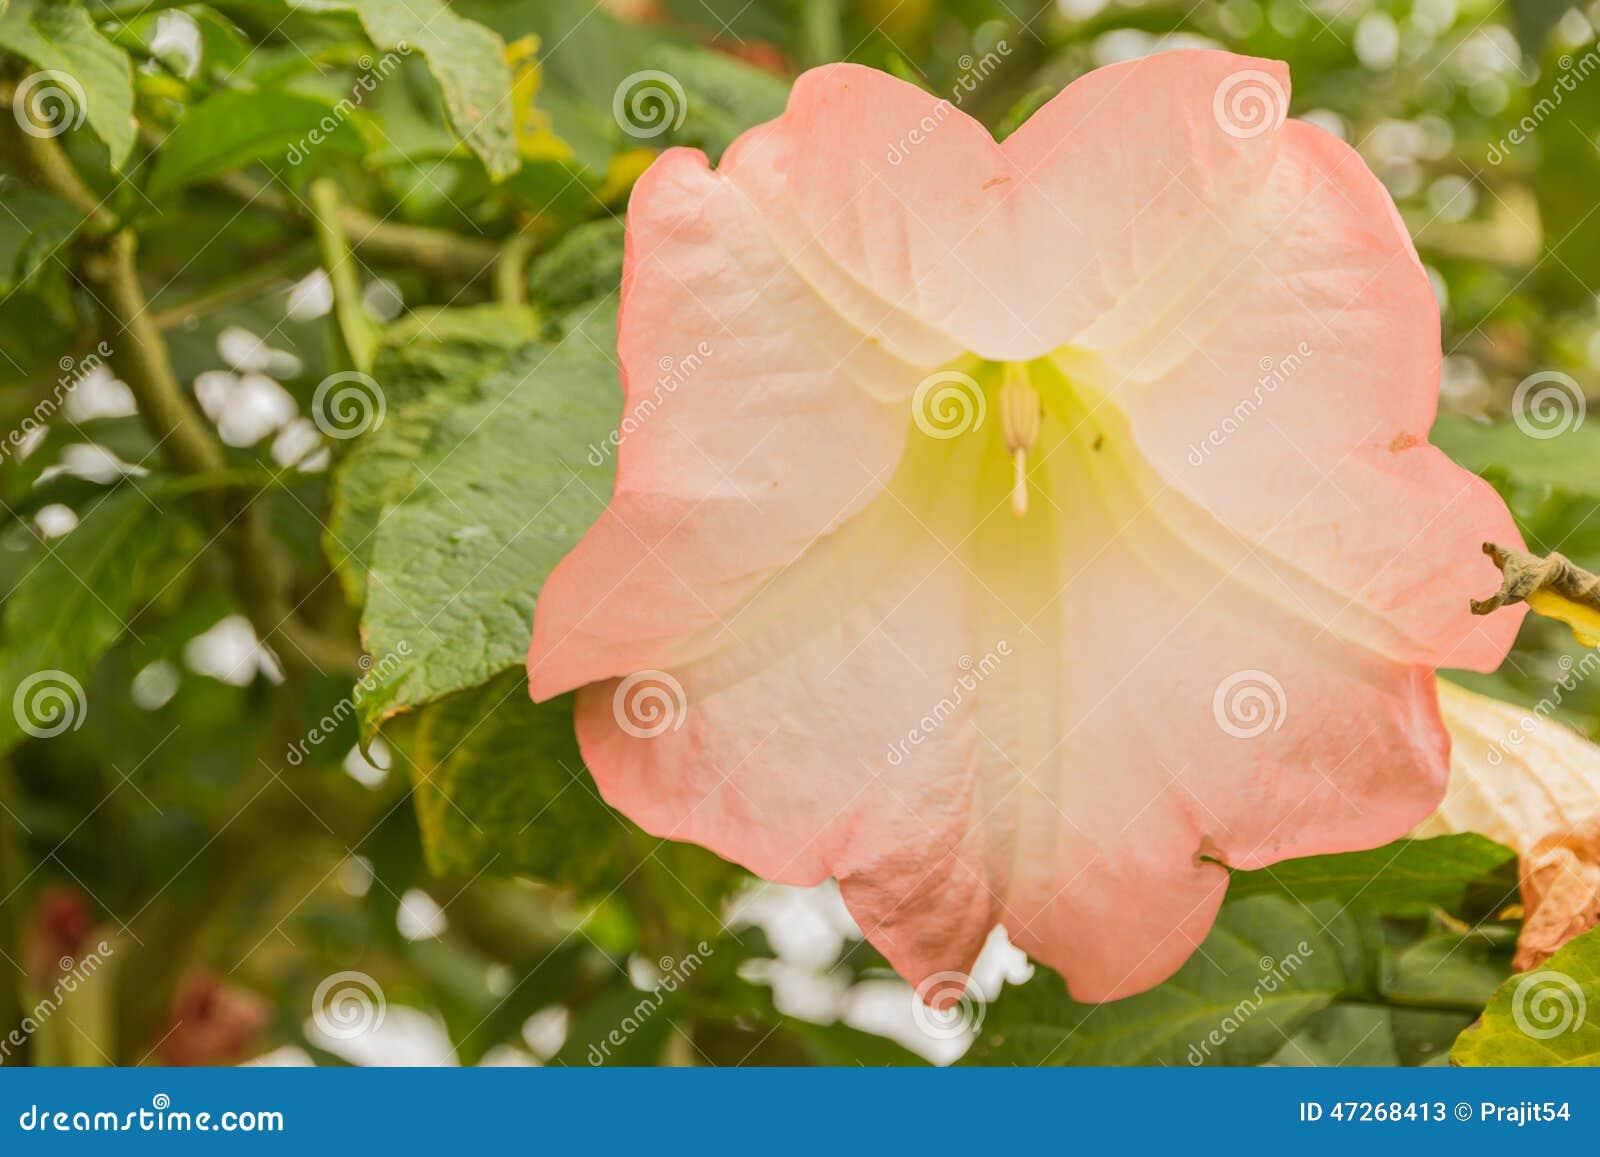 Datura Flower Stock Image Image Of Natural Plant Drug 47268413